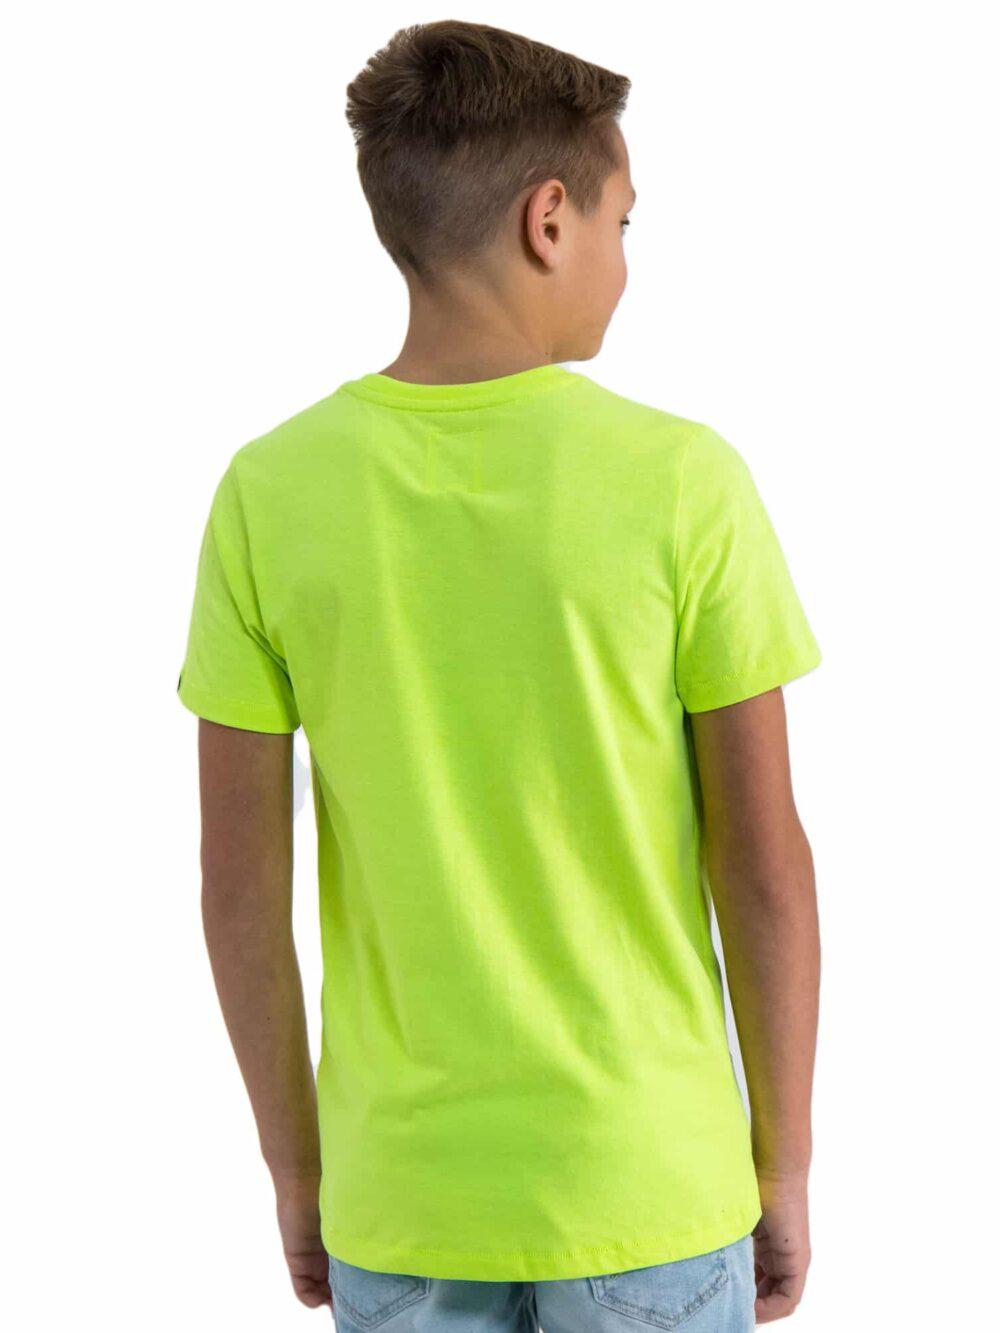 Garcia T-shirt O03400 Bright Yellow